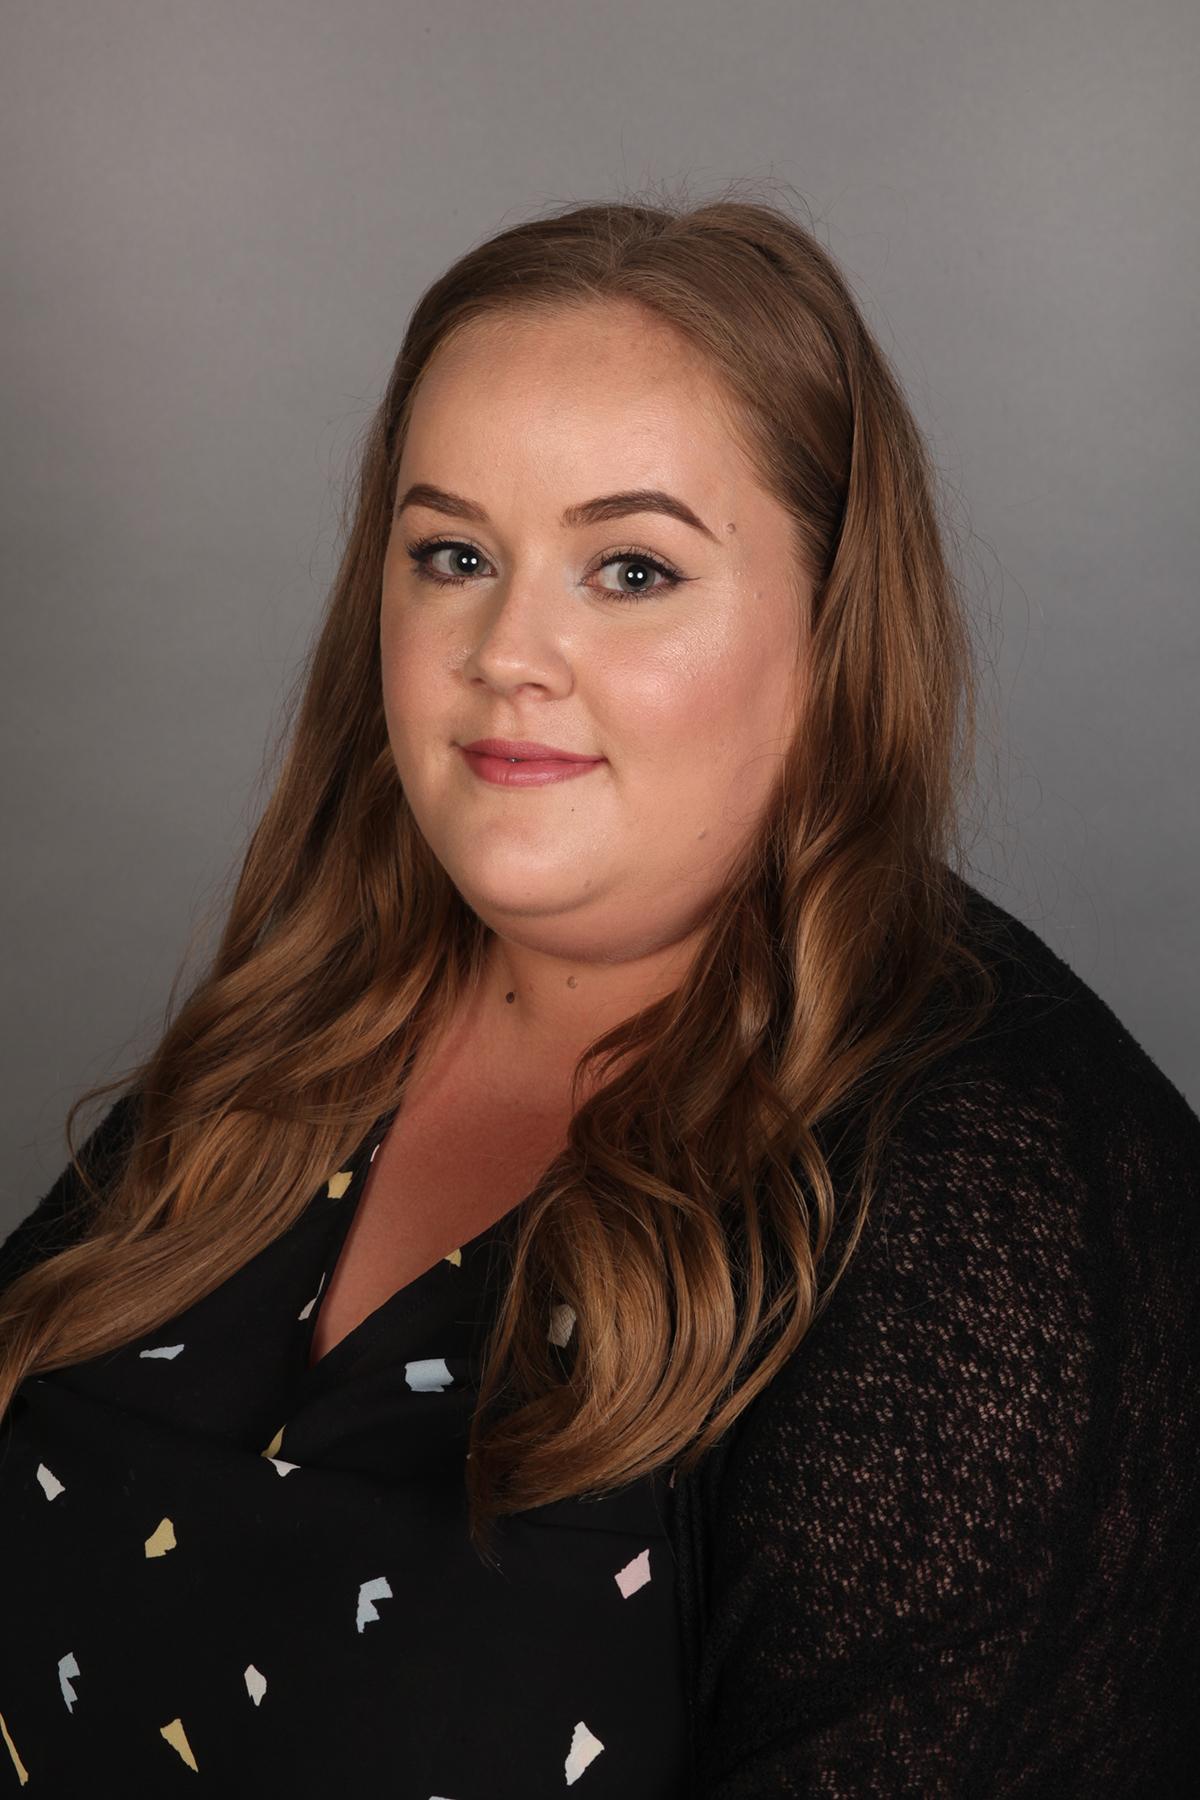 Rachel Gosnell-Maddock